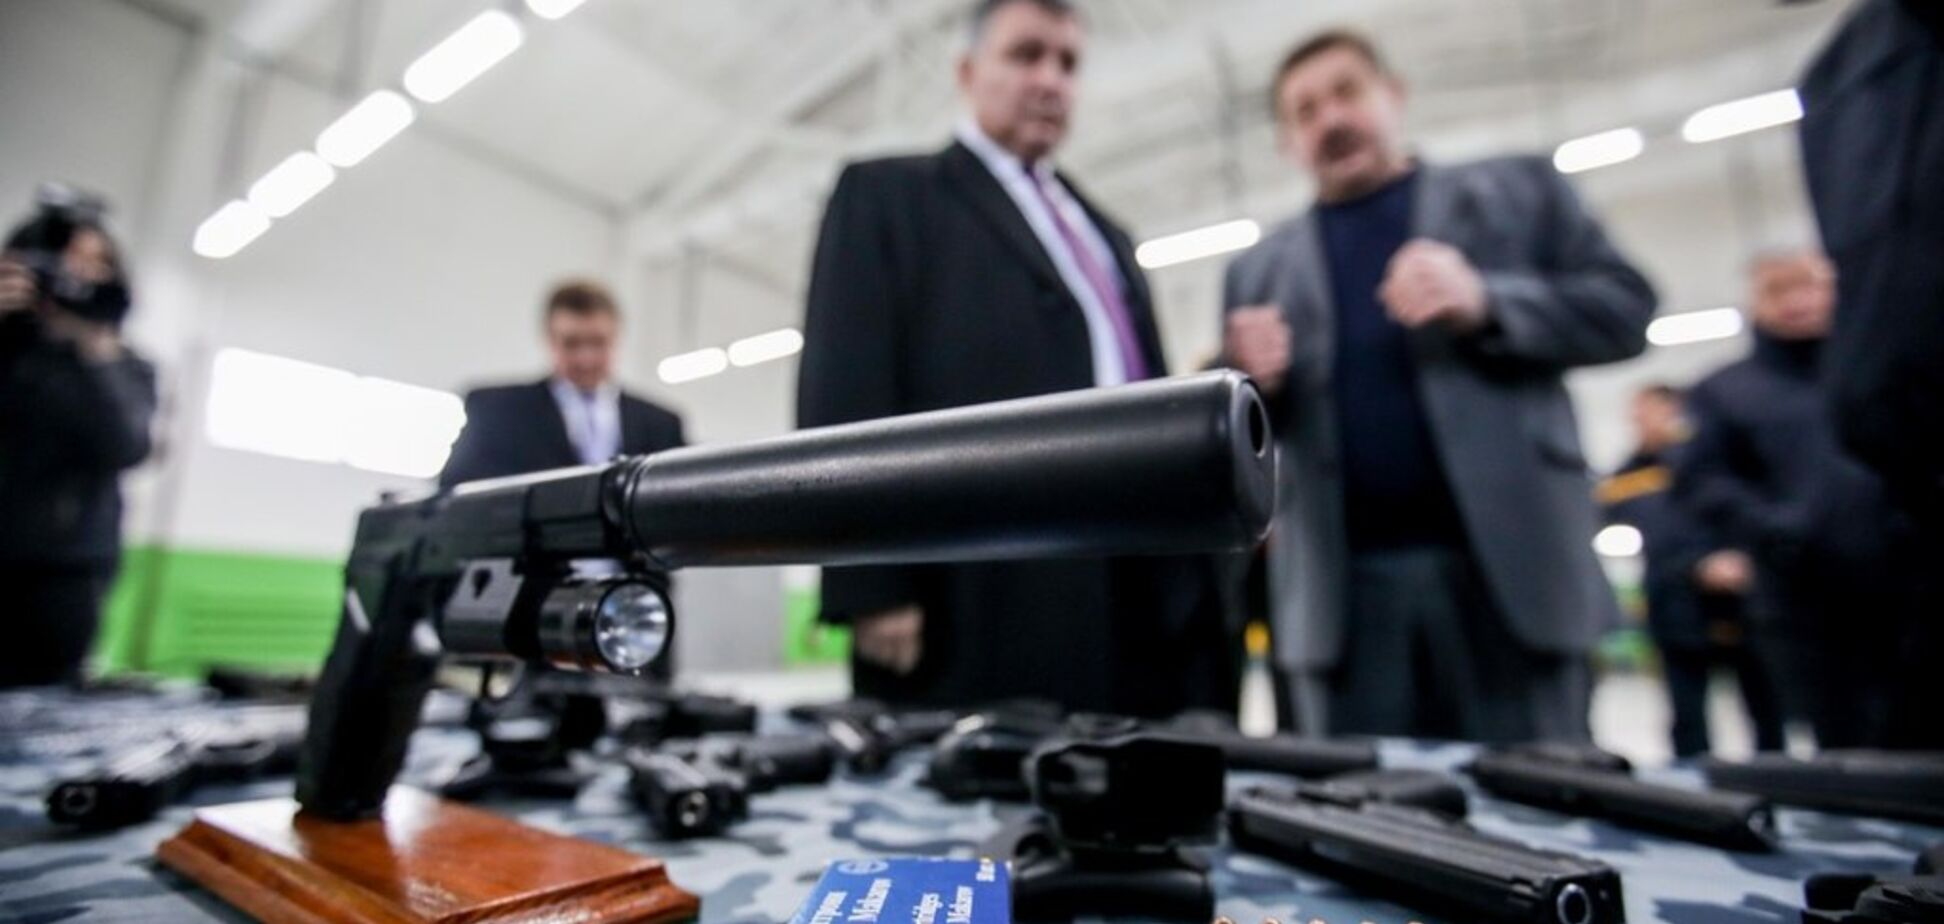 В Виннице запустили производство патронов для пистолетов МВД